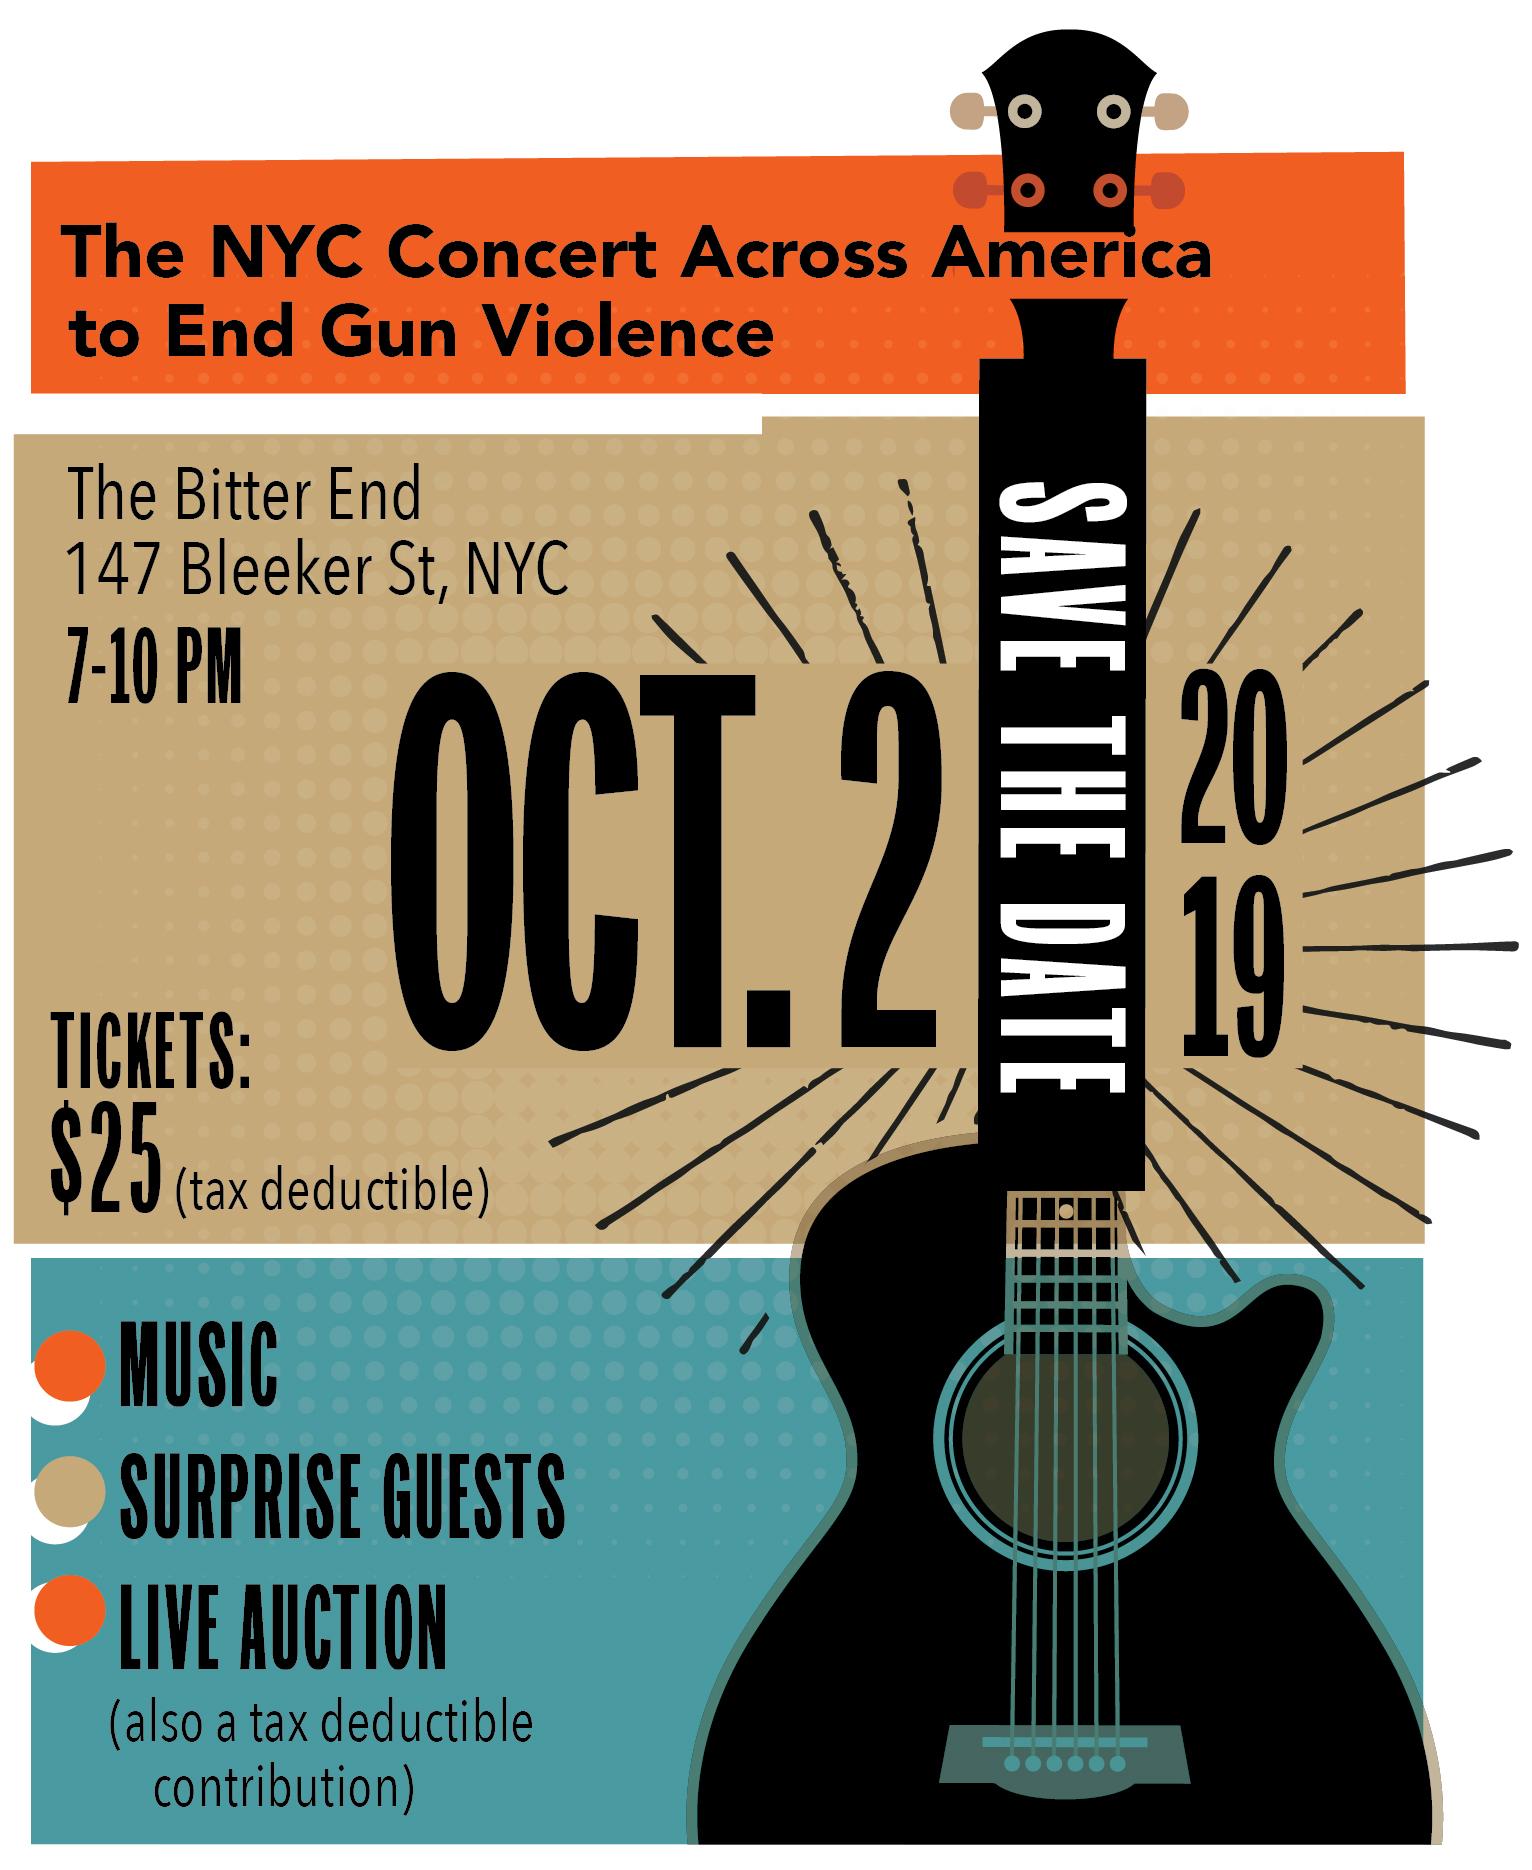 Concert across America flier-01.jpg